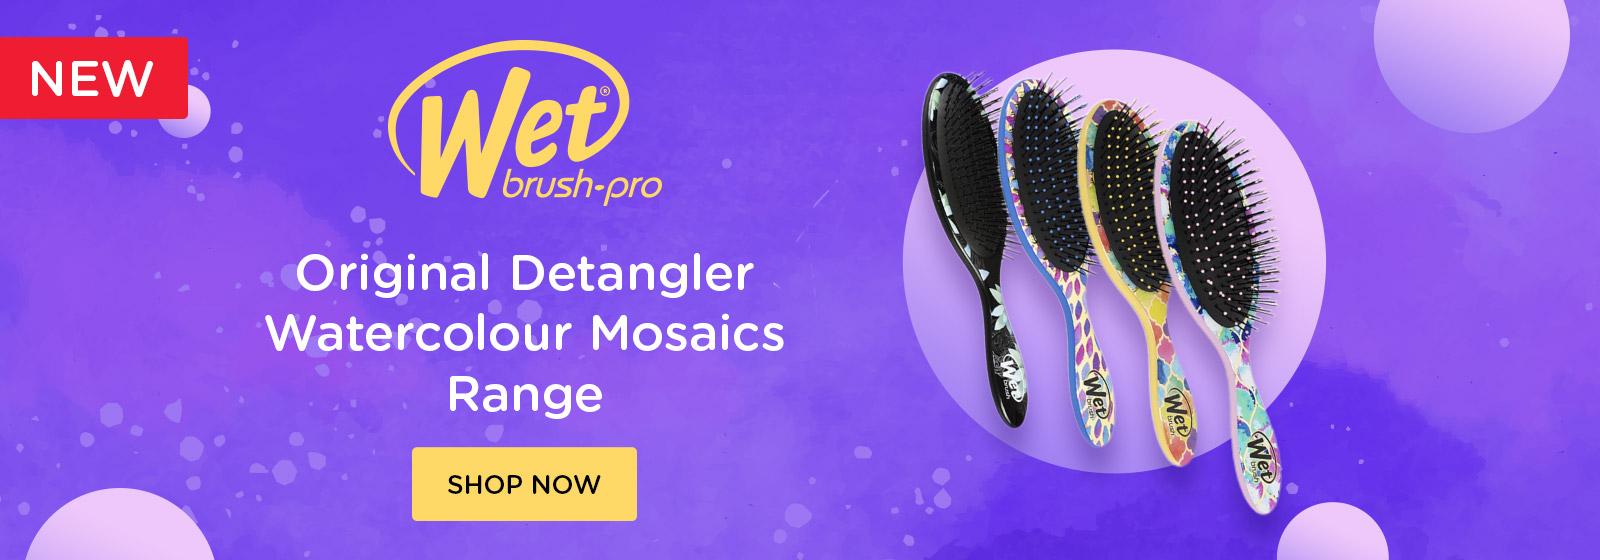 Wet Brush Pro New Mosiacs